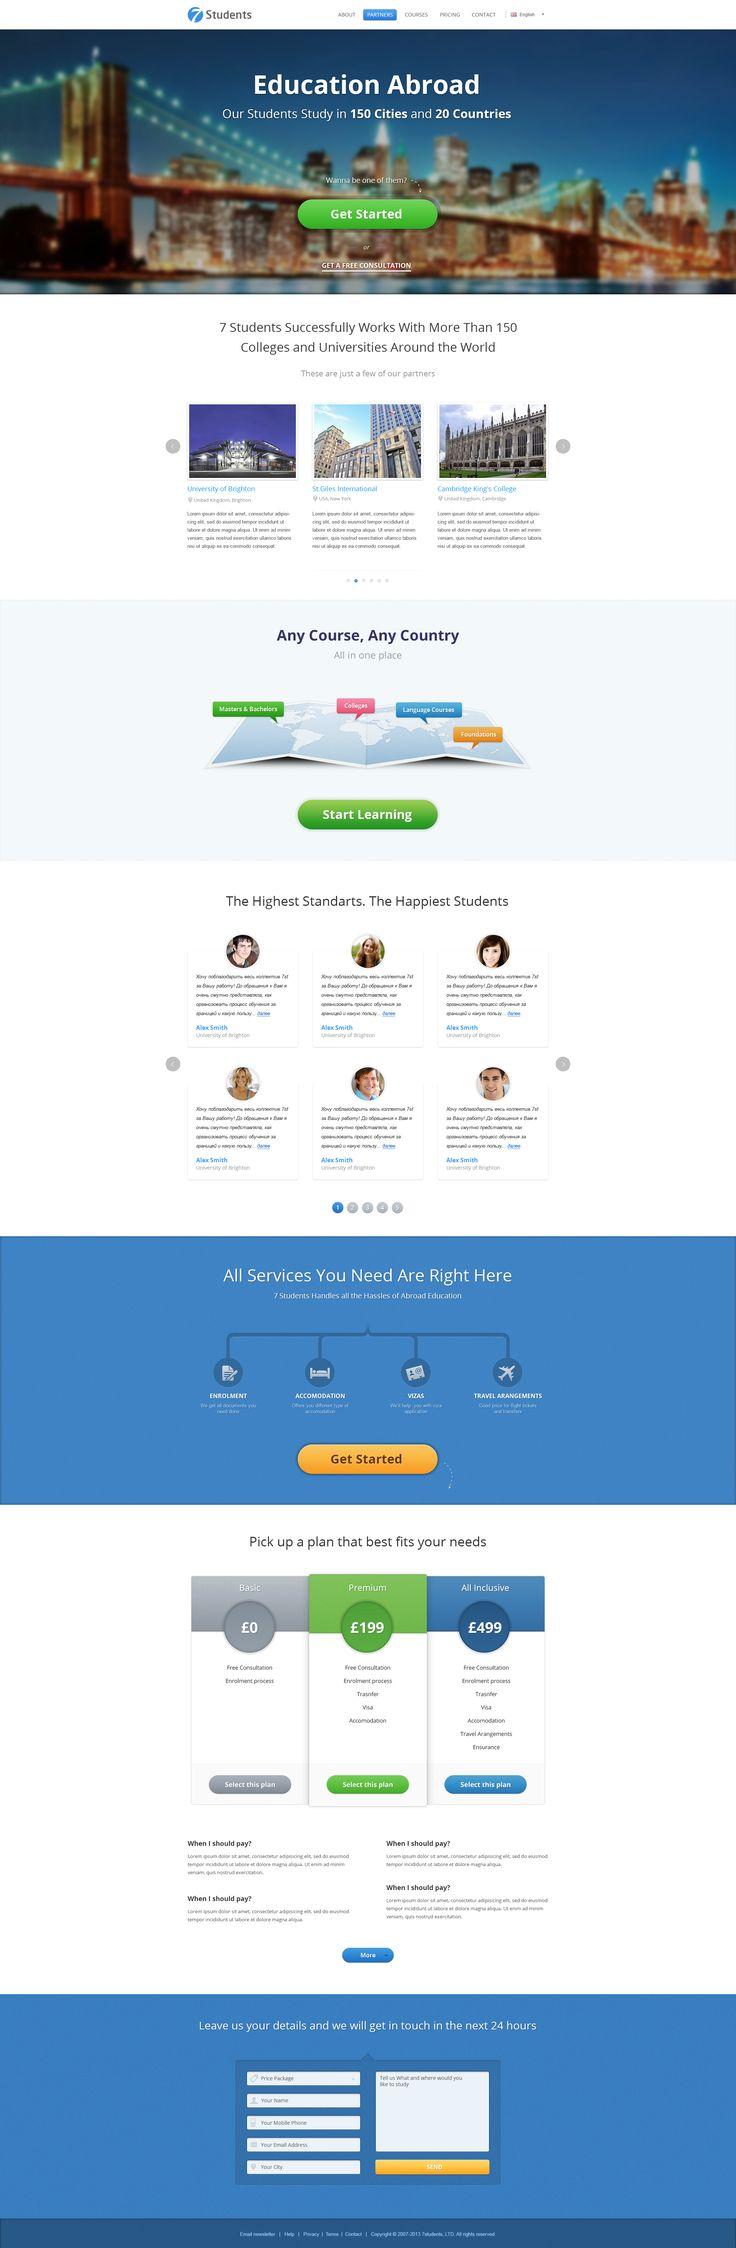 7 Students - Landing Page   #webdesign #it #web #design #layout #userinterface #website #webdesign <<< repinned by an #advertising #agency from #Hamburg / #Germany - www.BlickeDeeler.de   Follow us on www.facebook.com/BlickeDeeler